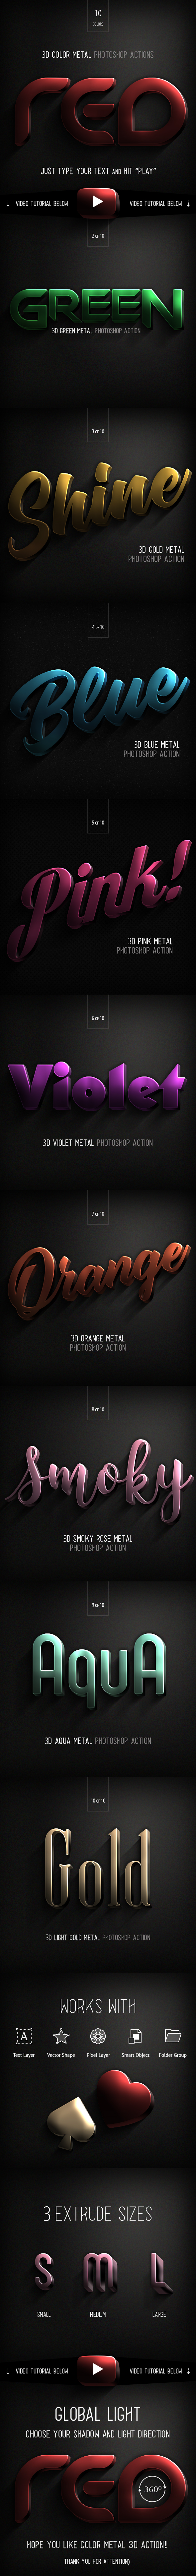 3D Color Metal - PS Actions